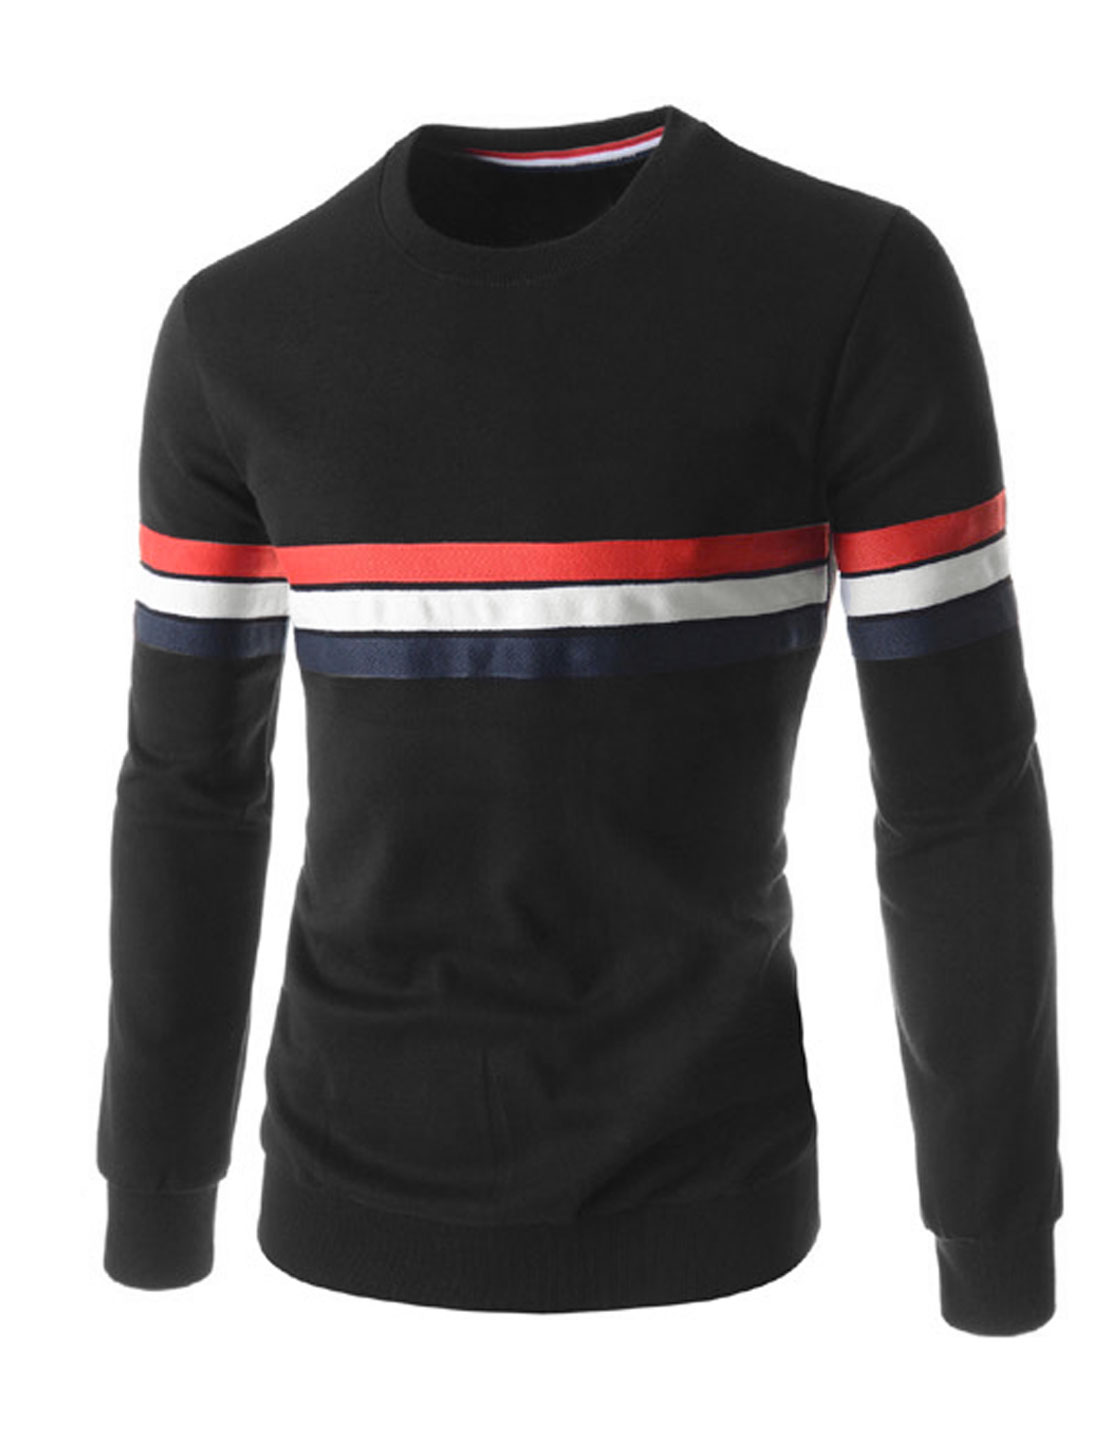 Men Stripes Design Stitching Round Neck Long Sleeves T-shirt Black M